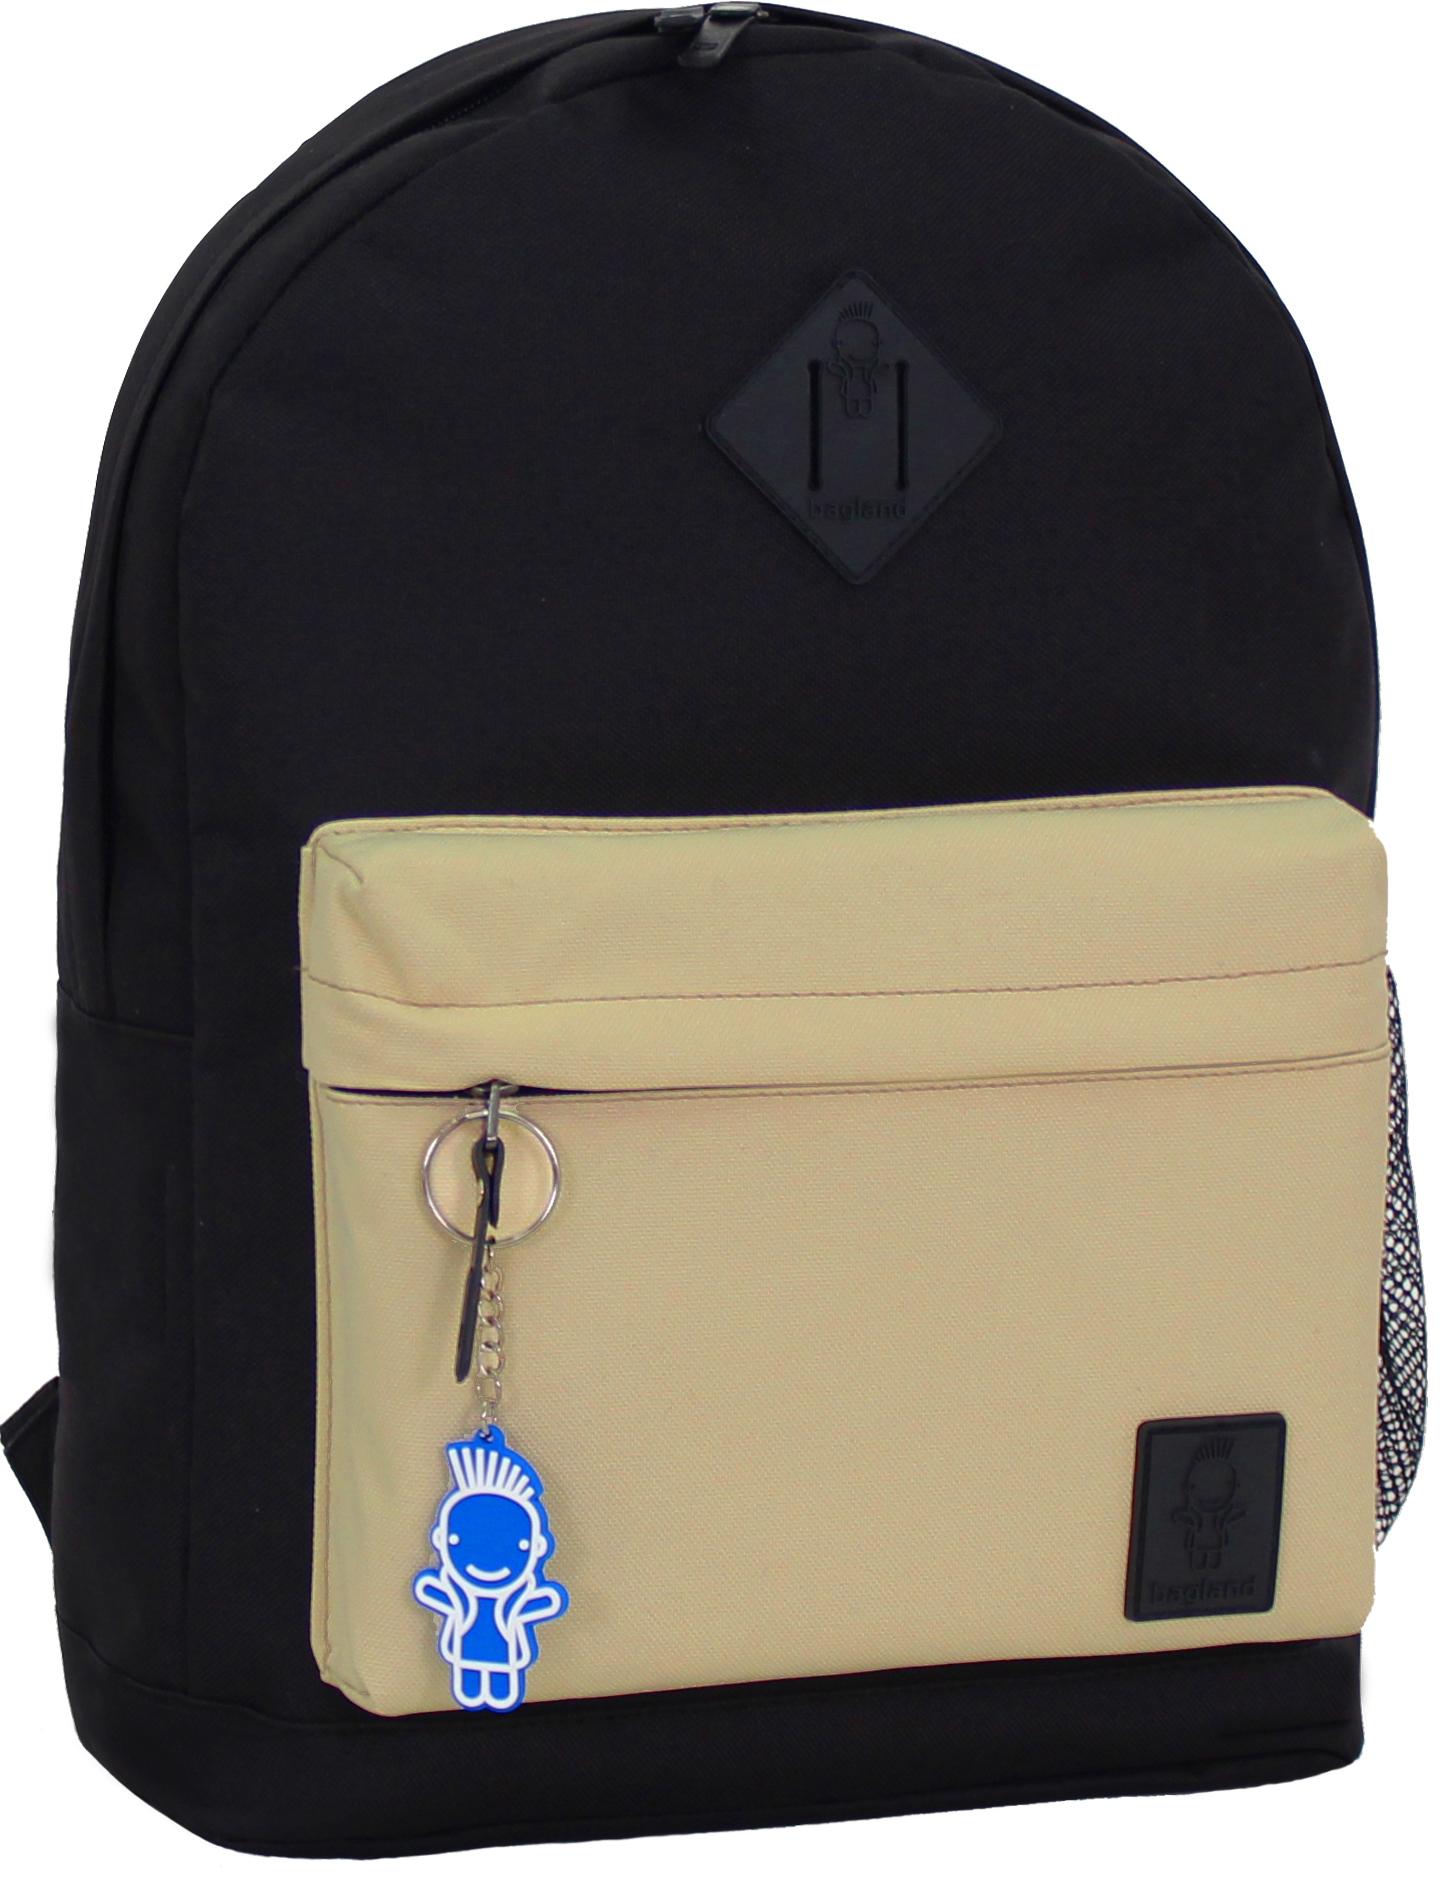 Городские рюкзаки Рюкзак Bagland Молодежный W/R 17 л. чорн/бежевий (00533662) IMG_0876.JPG